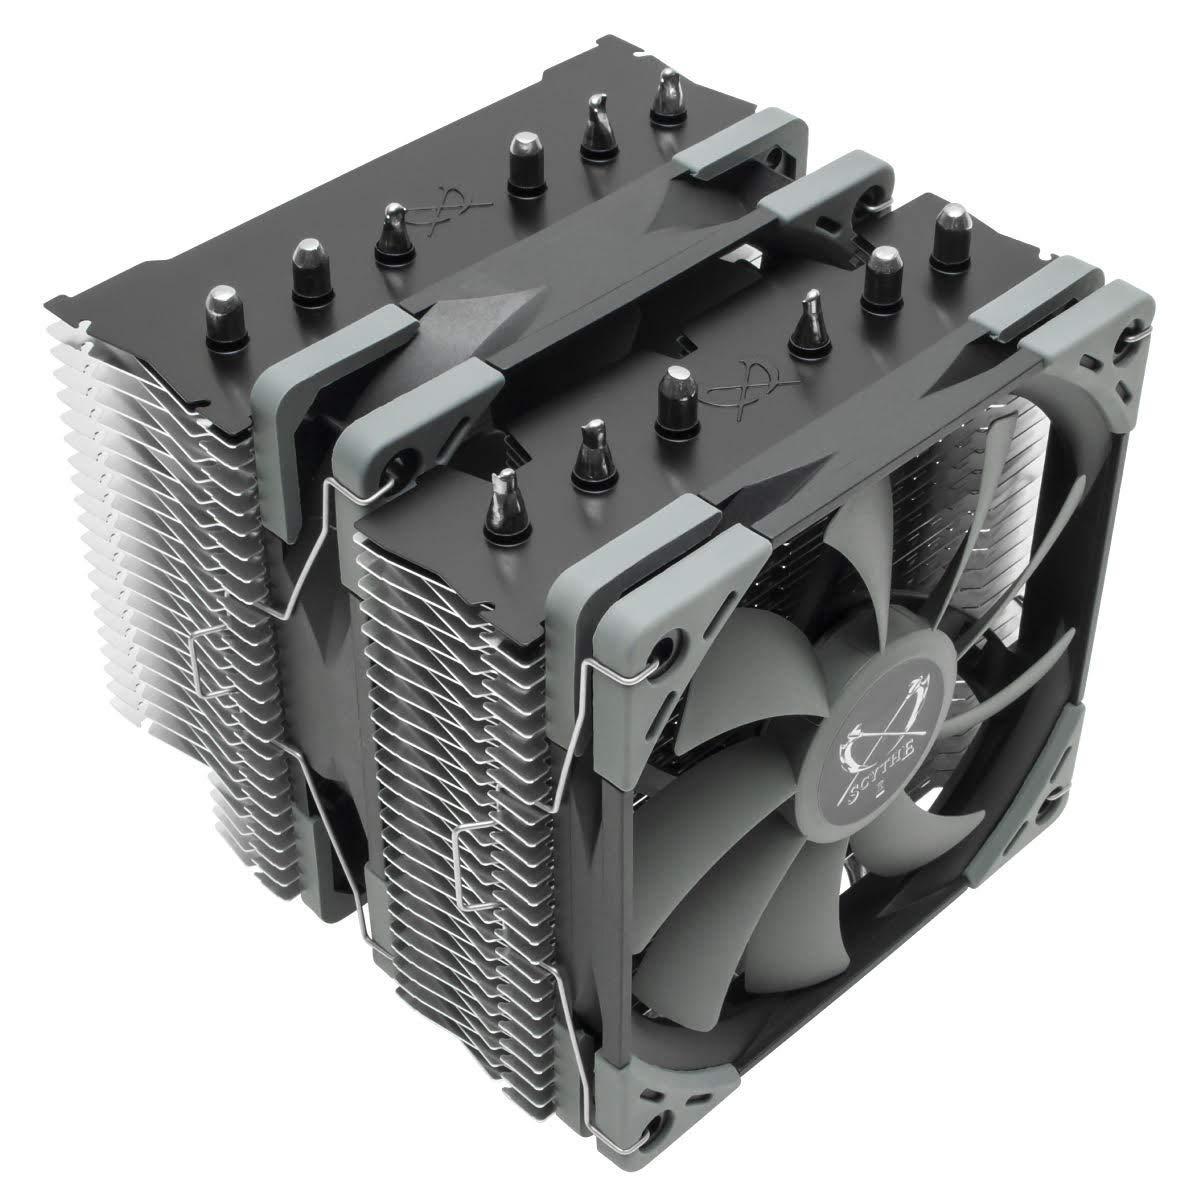 CPU Cooler Scythe Fuma 2 Air Cooler Intel LGA1151 AMD AM4/Ry